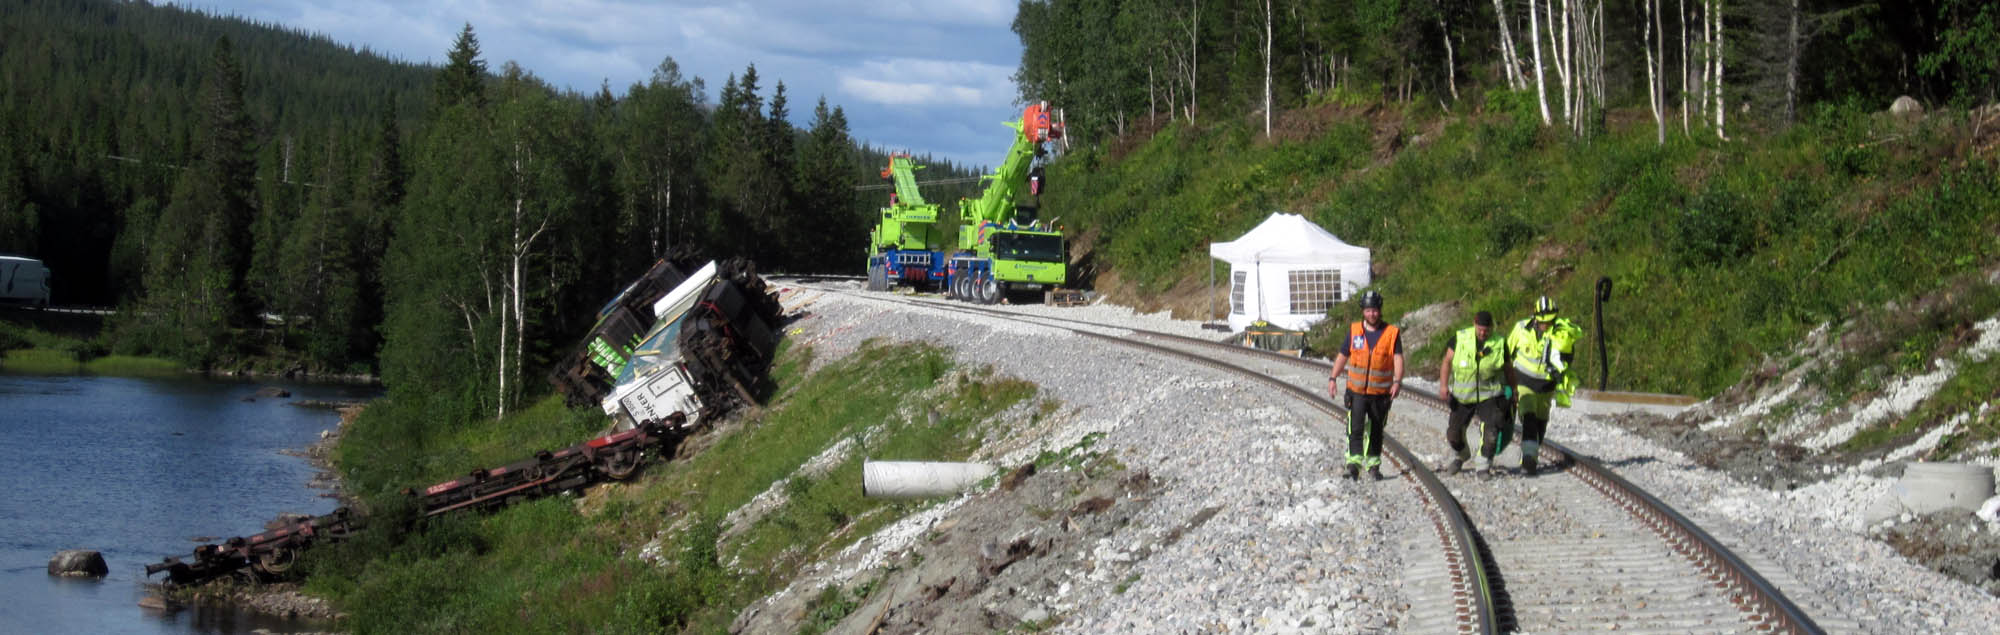 Kynningsrud Nordic Crane vant europeisk pris!